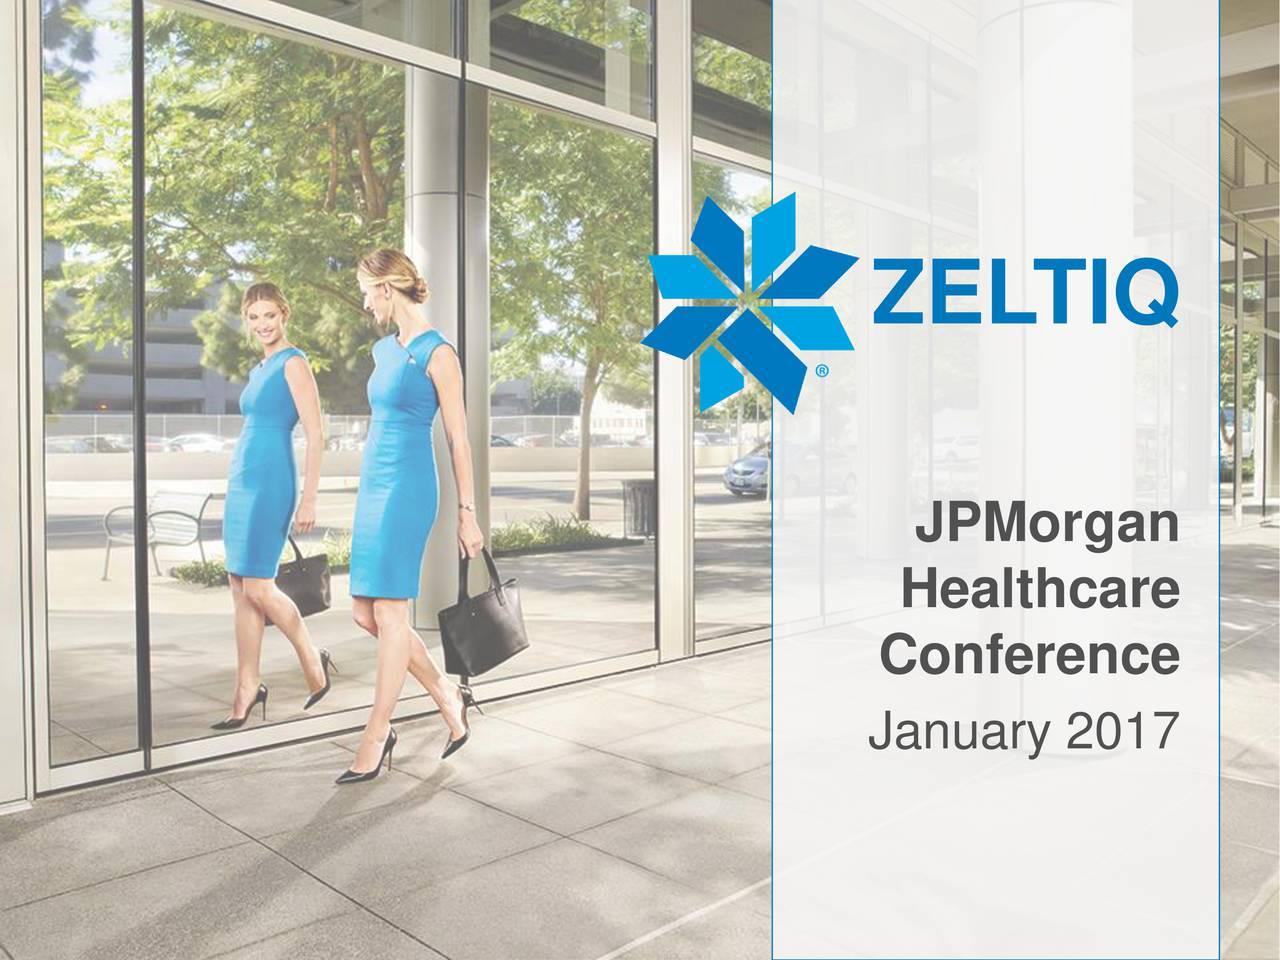 JPMorgan Healthcare Conference January 2017